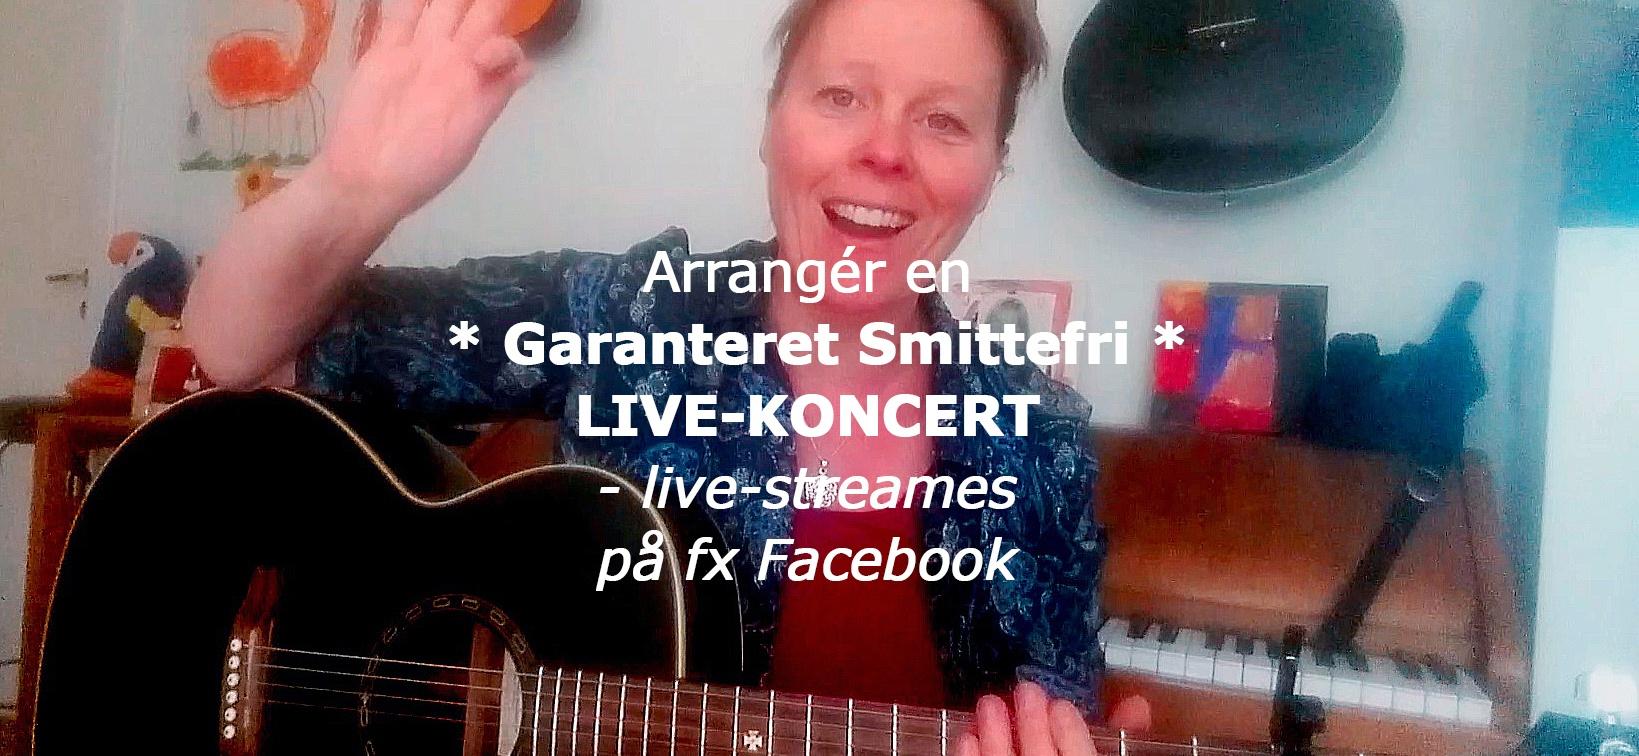 Live-streamet online-koncert med singer-songwriter June Beltoft